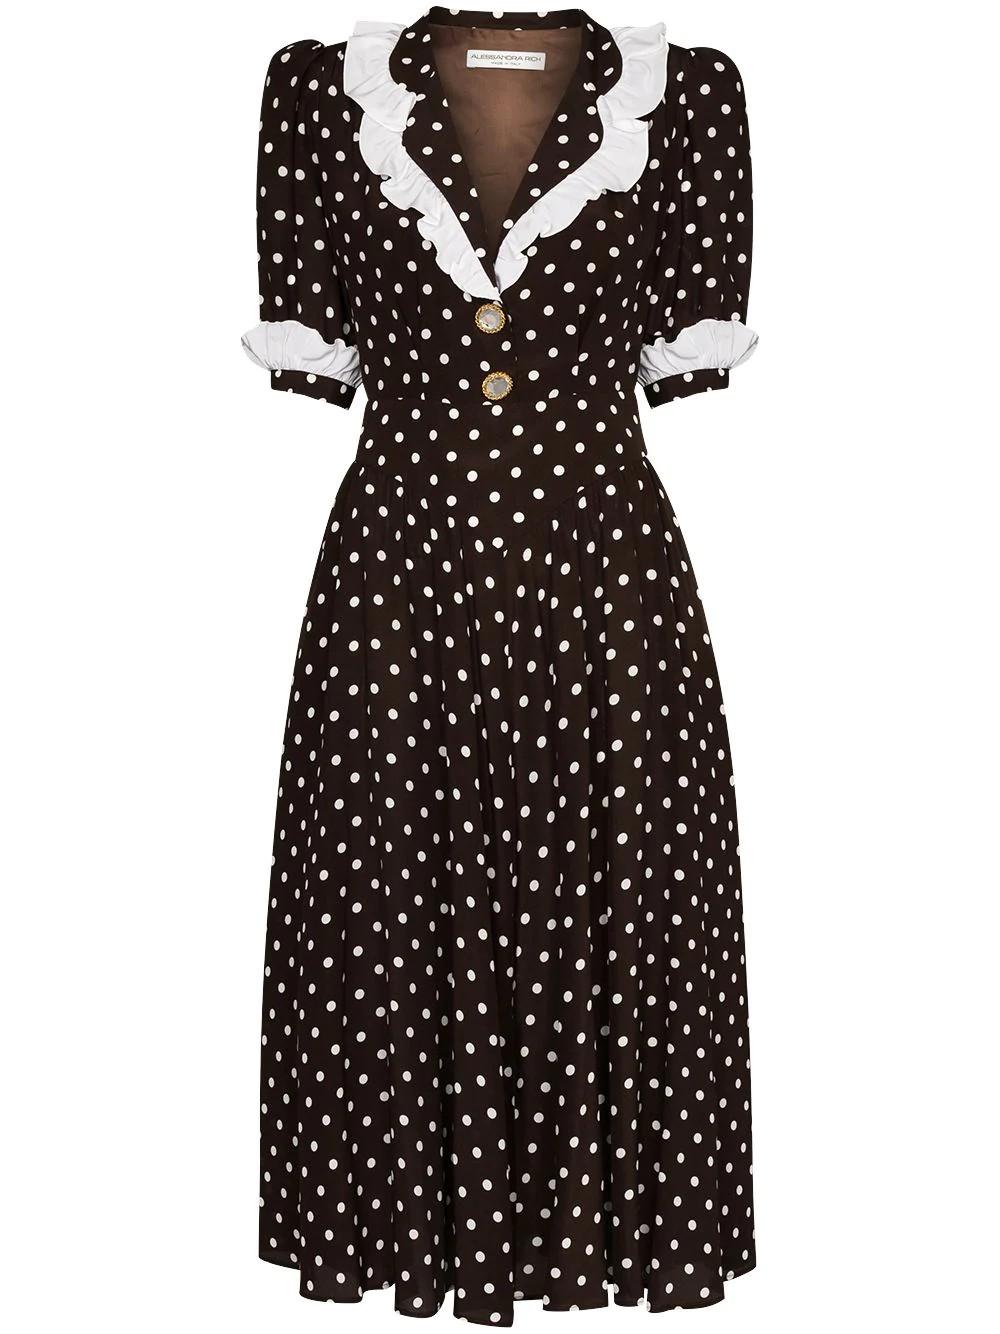 POLKA DOT SILK DRESS WITH COLLAR & ruffle details